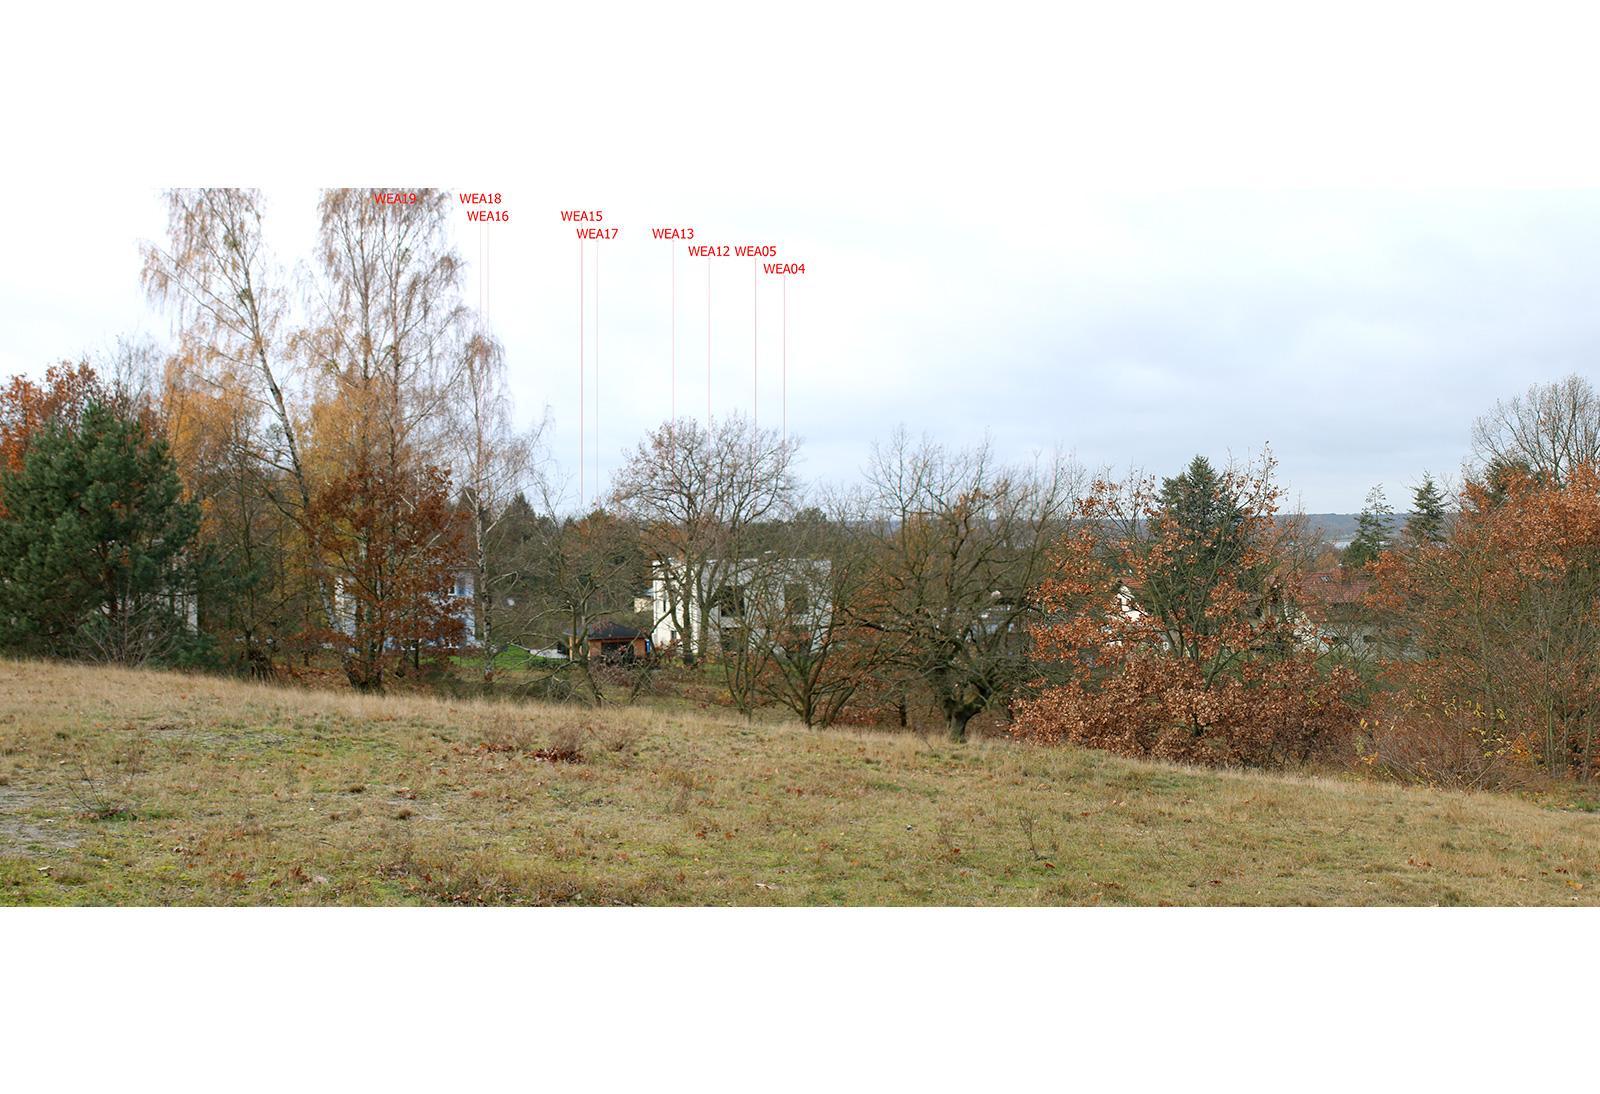 Caputh Position 3 Am Krähenberg Visualualisierung